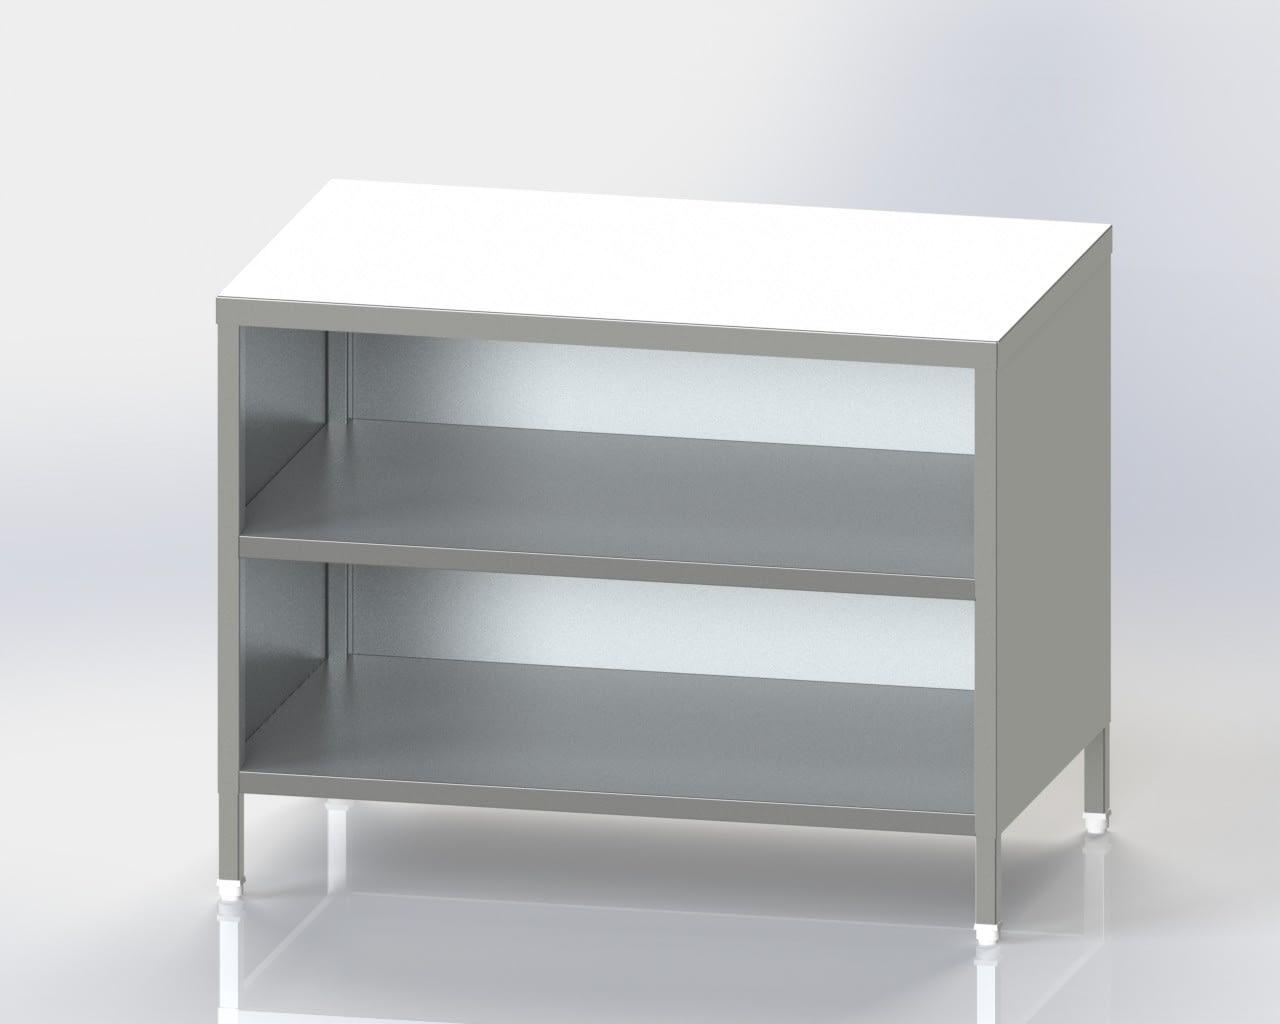 Thali Counter / Lower and Intermediate Shelf